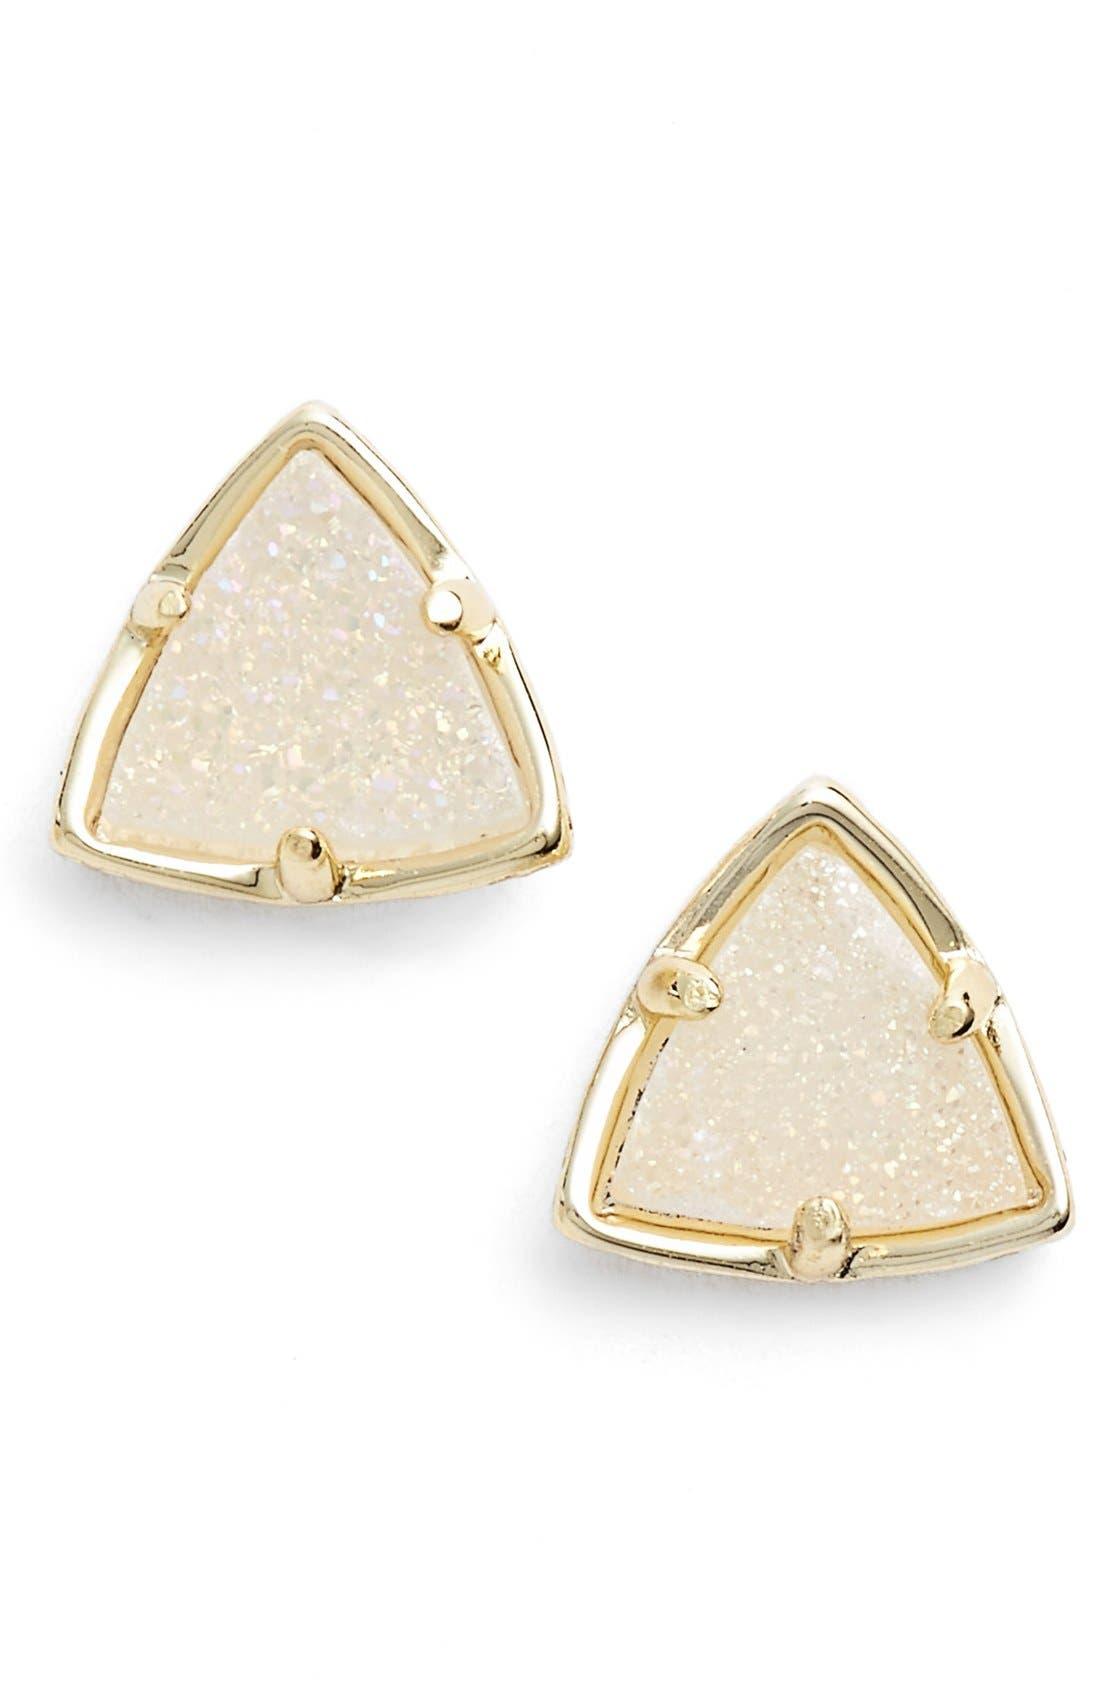 Main Image - Kendra Scott 'Parker' Stud Earrings